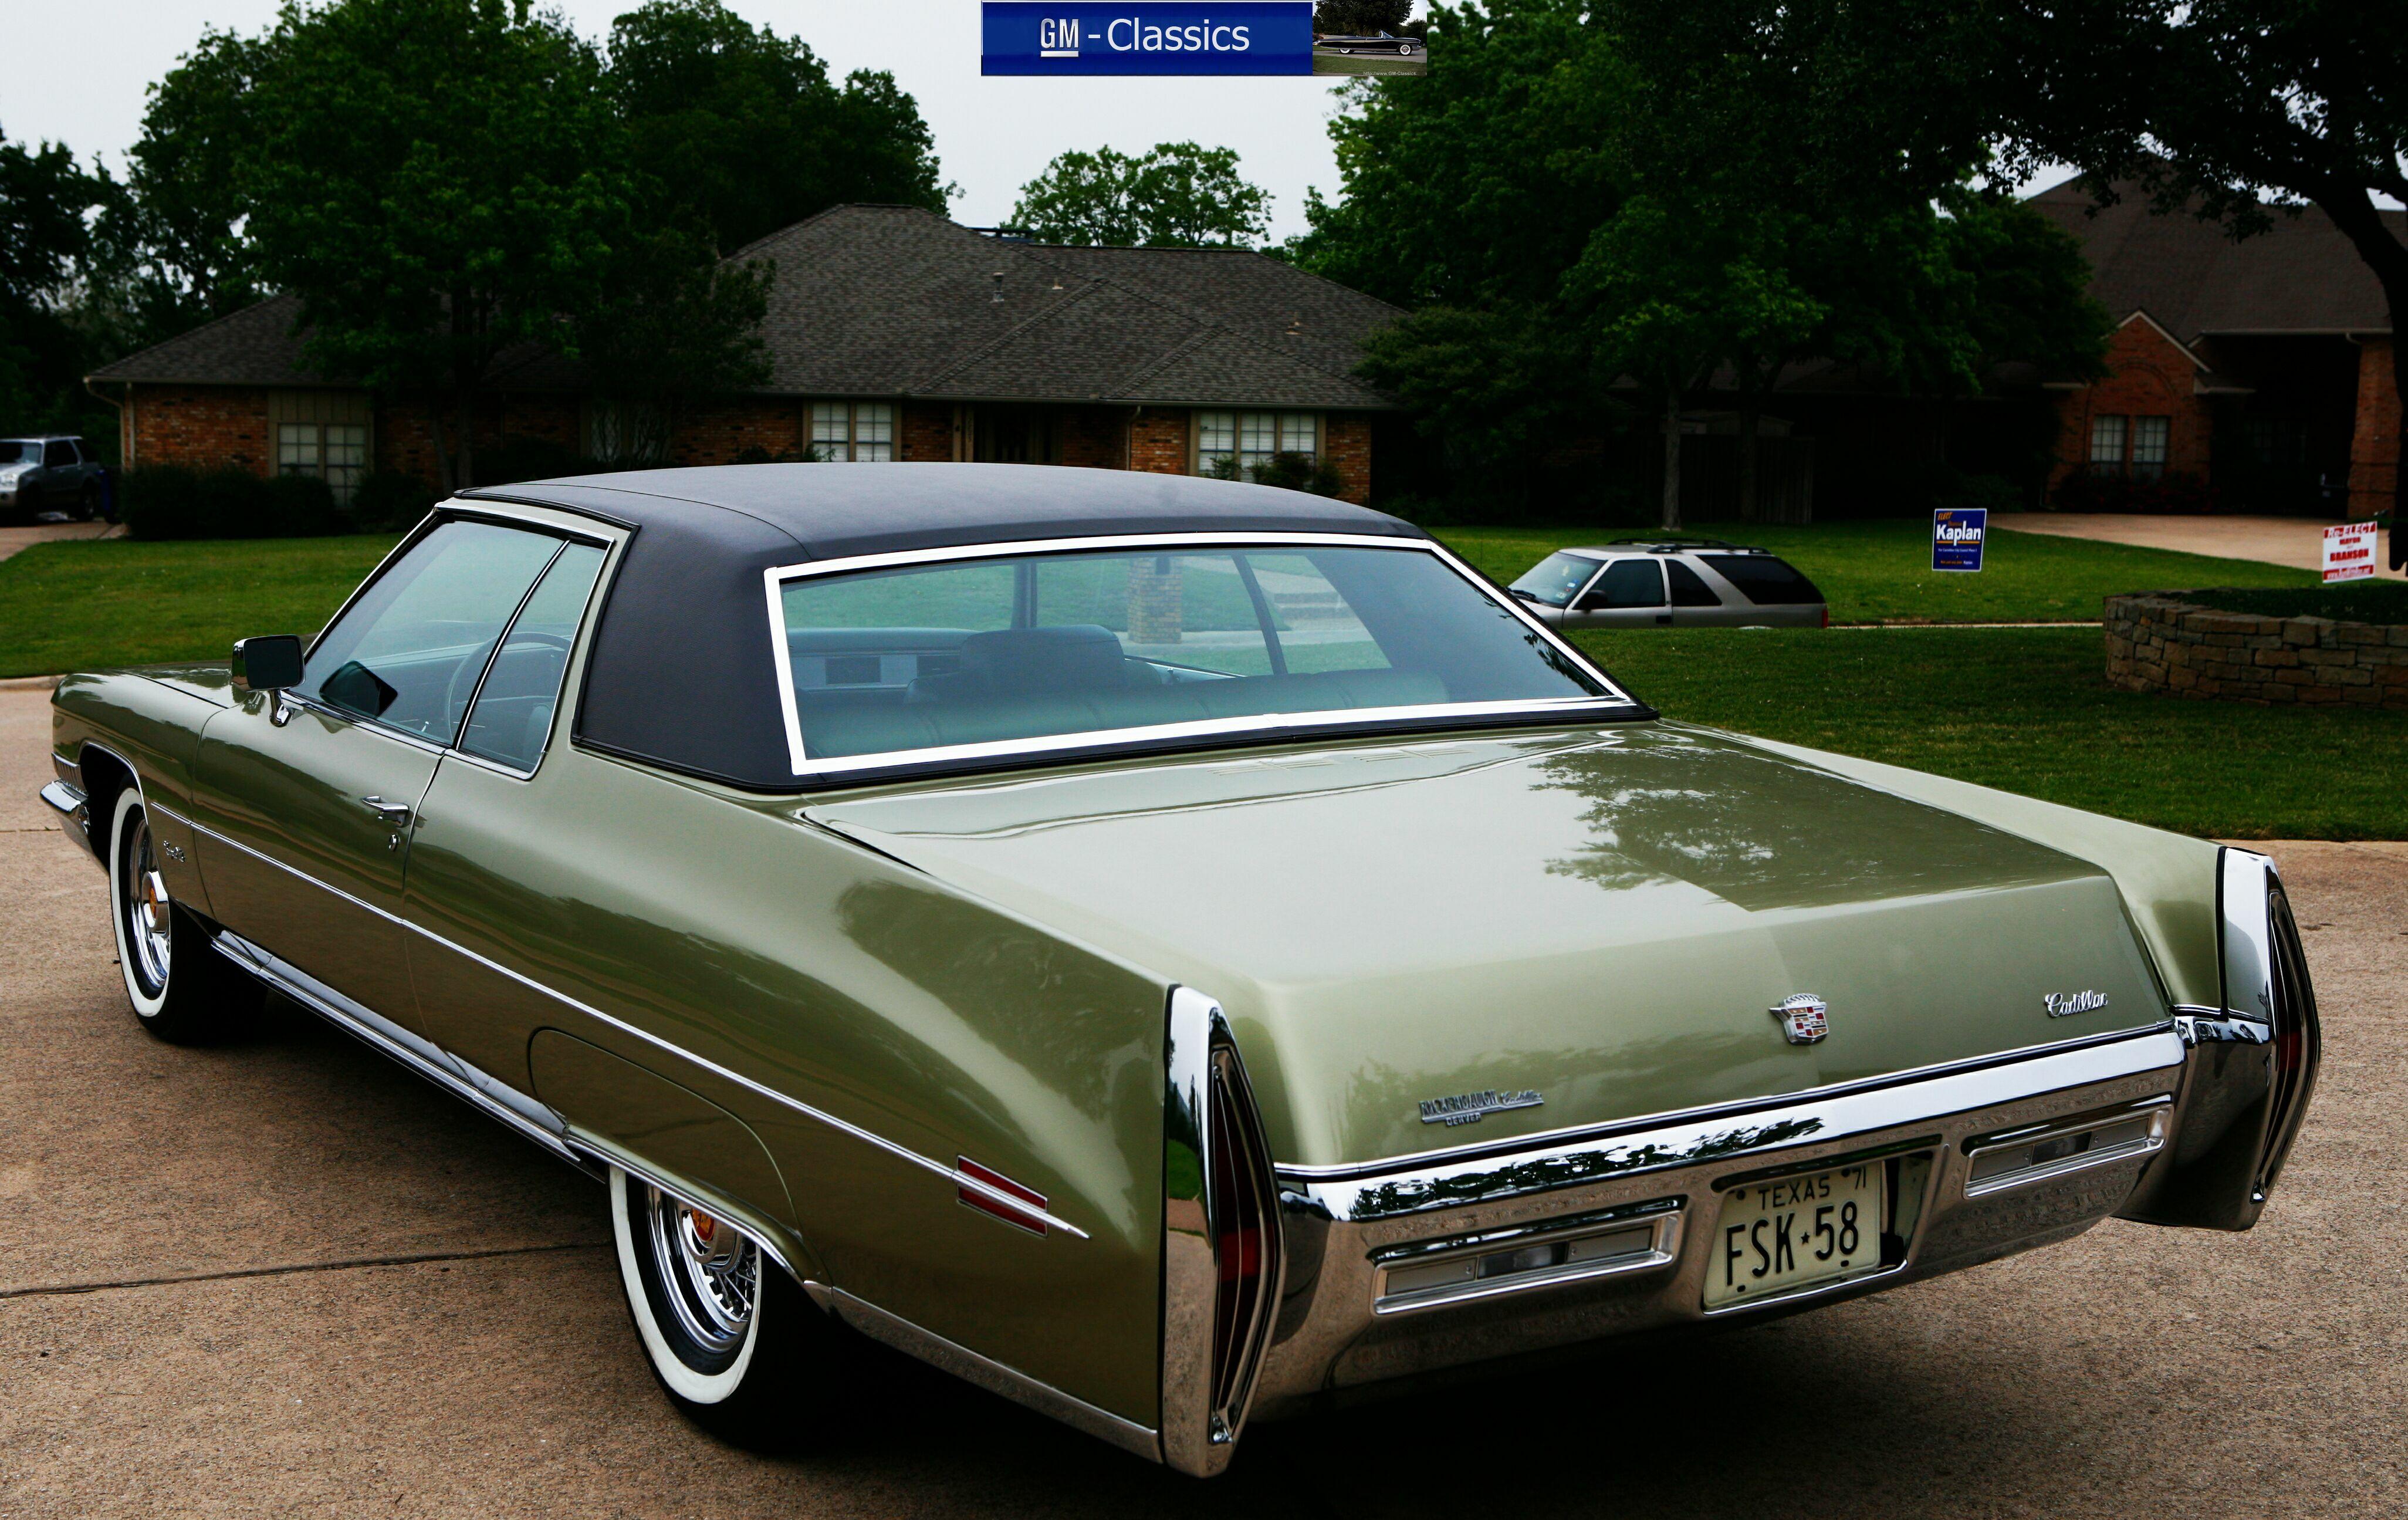 1971 Cadillac Coupe Deville - Matt Garrett